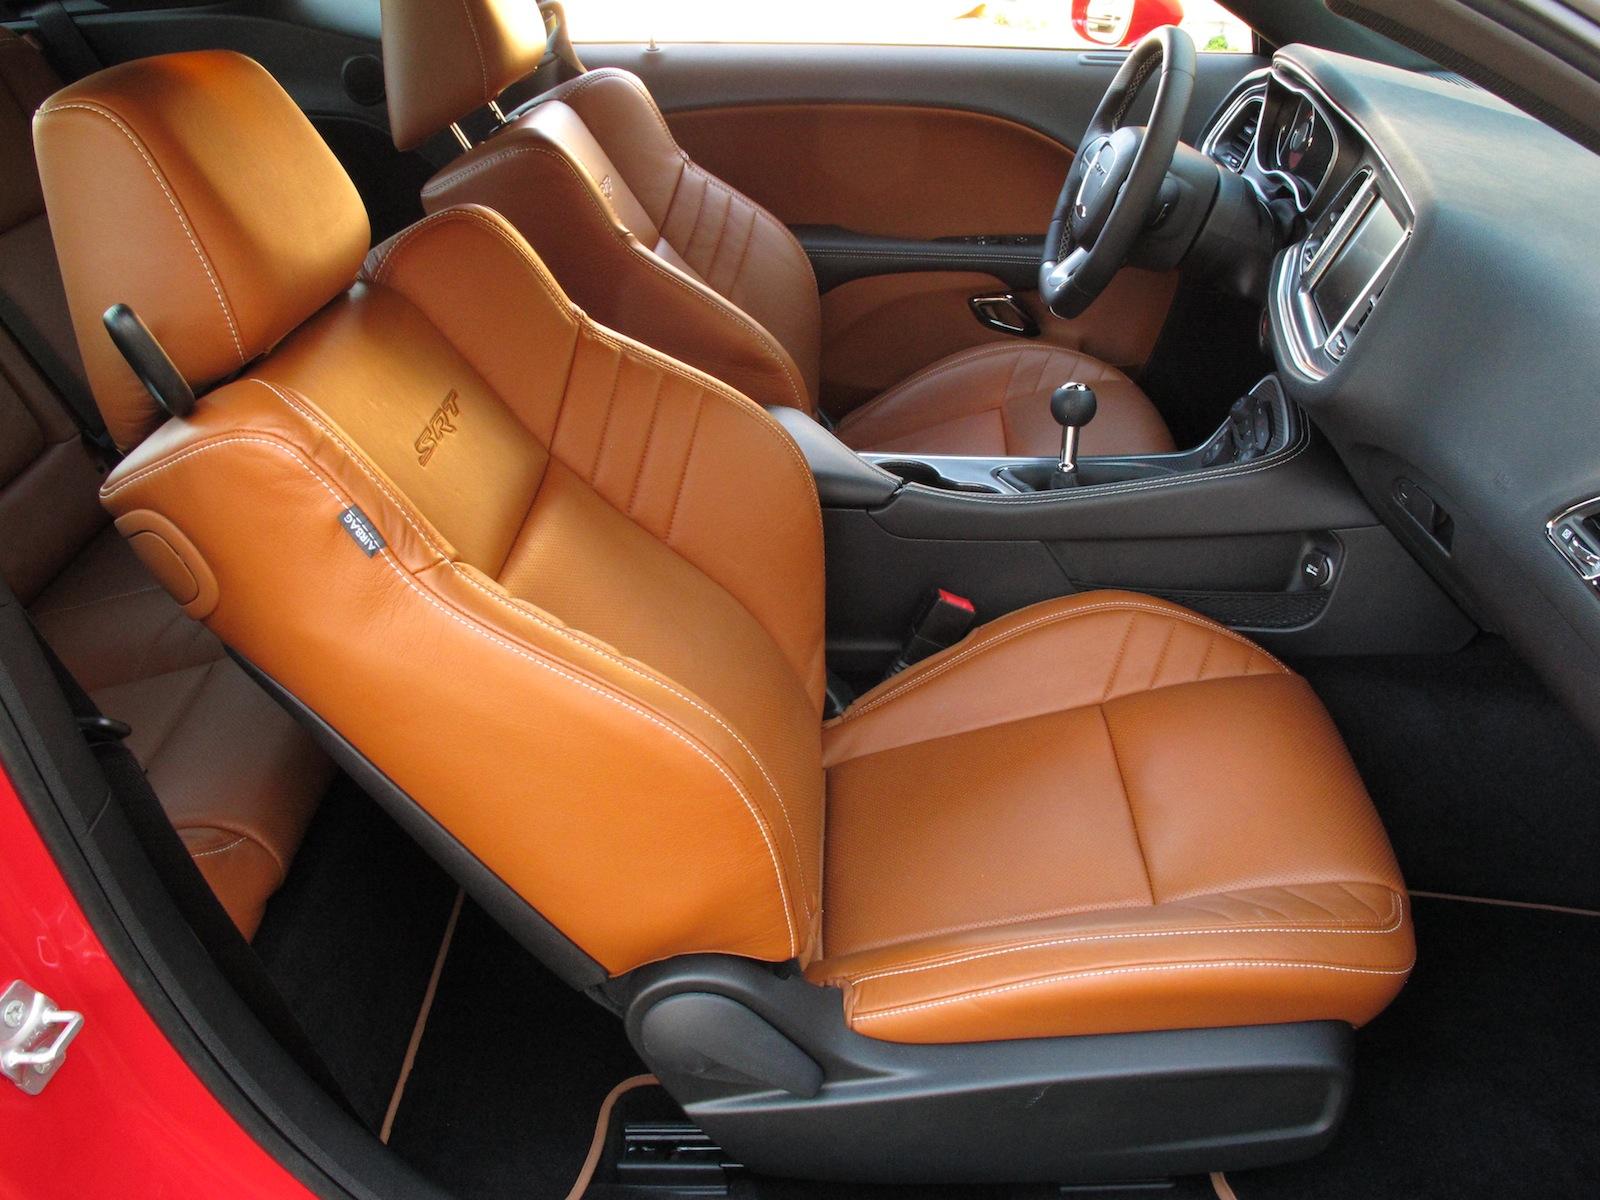 2015 dodge challenger srt hellcat front leather seats